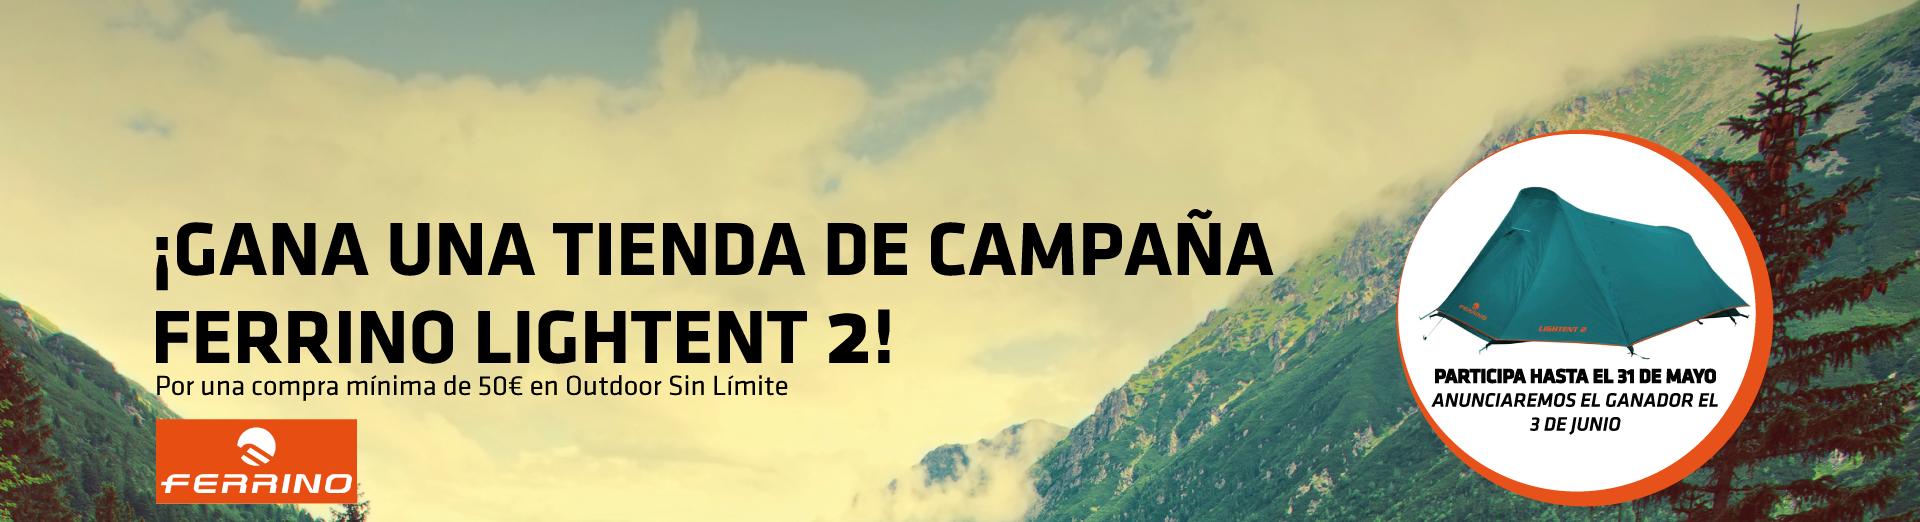 SORTEO TIENDA DE CAMPAÑA FERRINO LIGHTENT 2